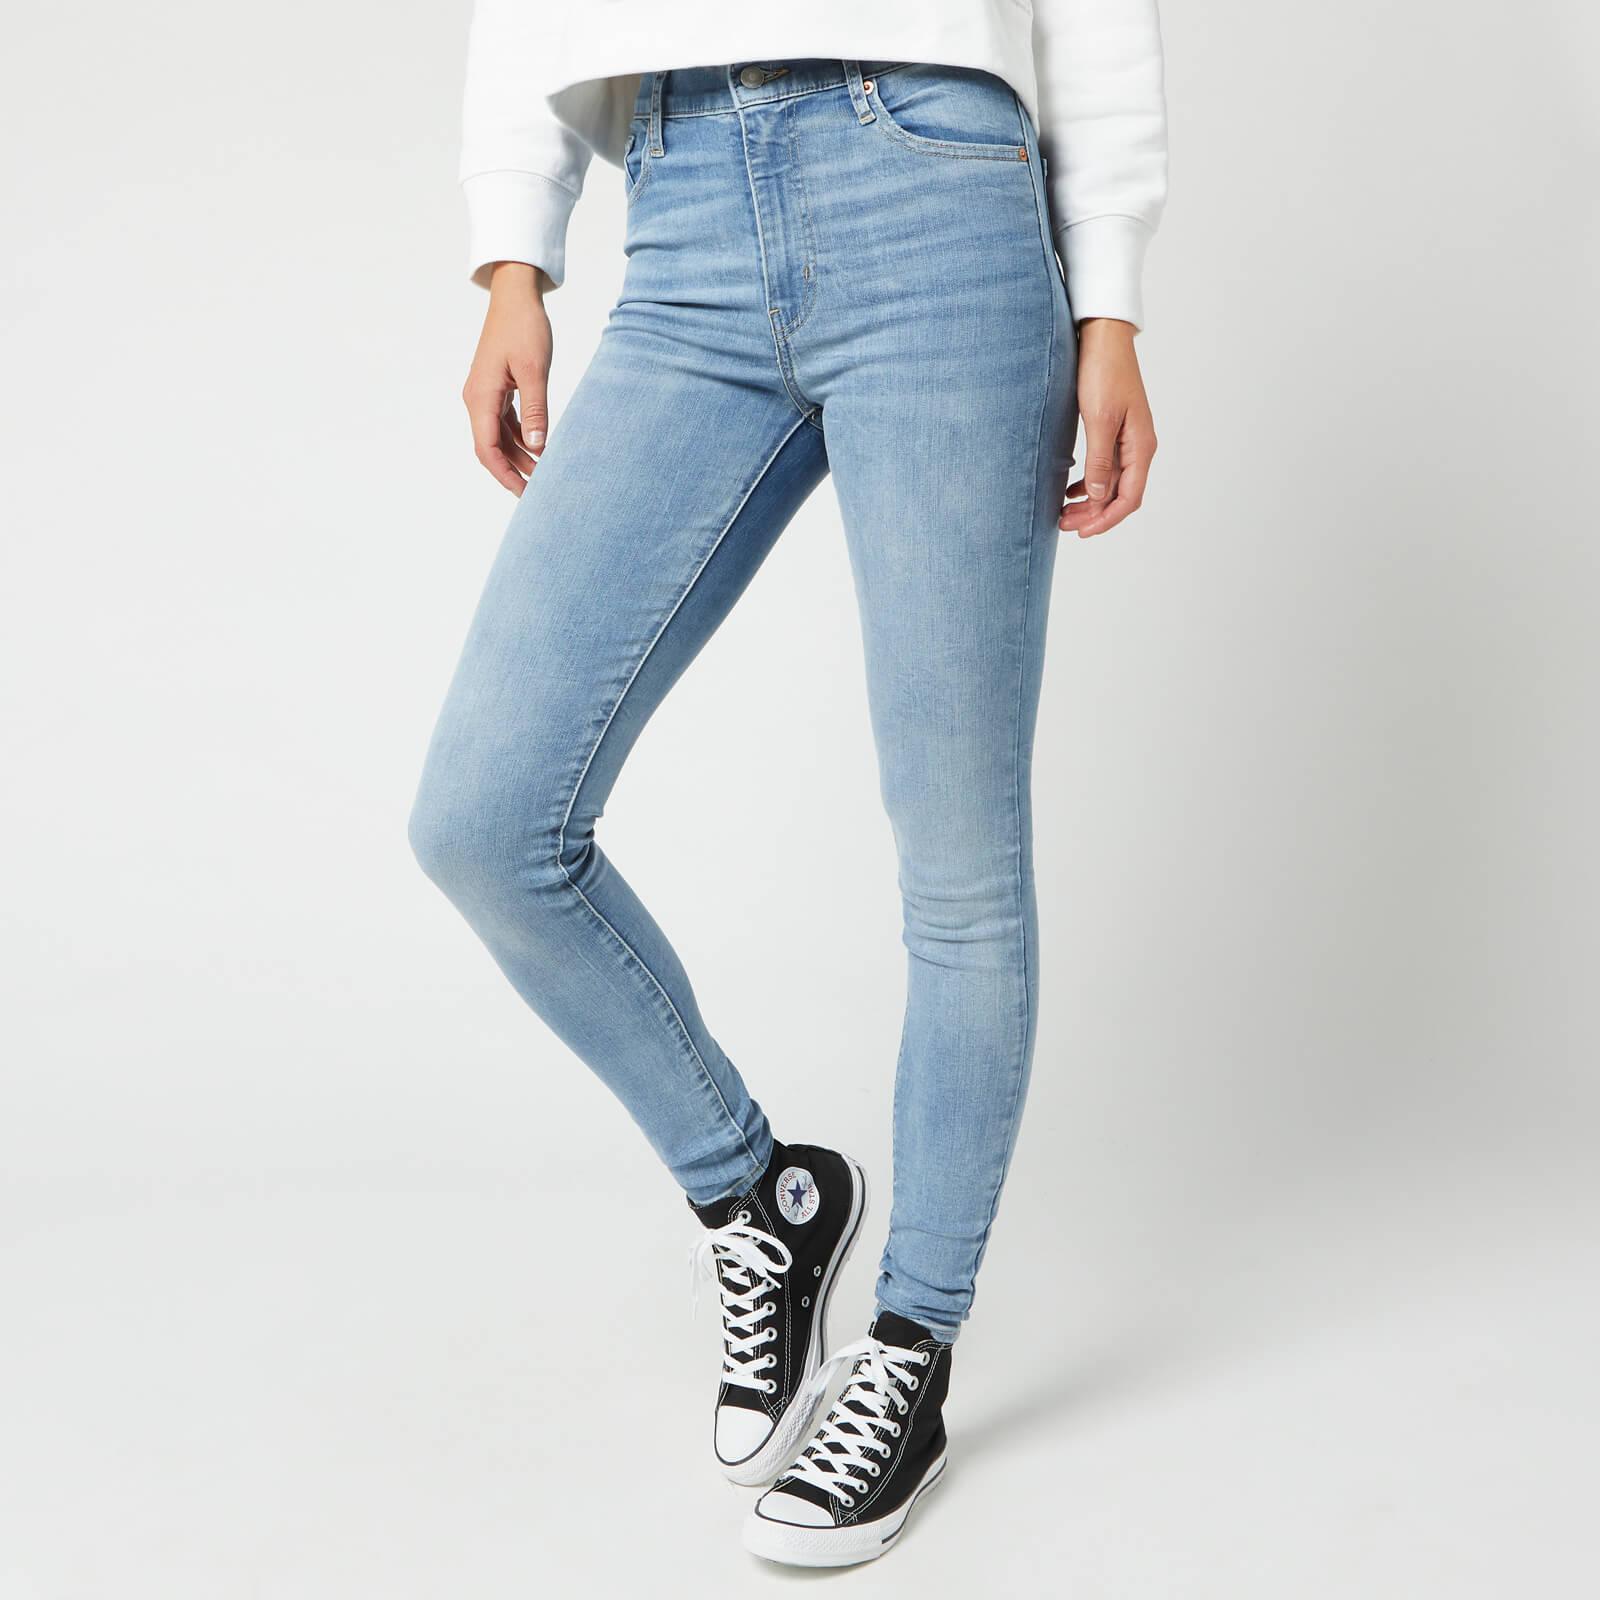 Levi's s Mile High Super Skinny Jeans - You Got Me - W30/L32